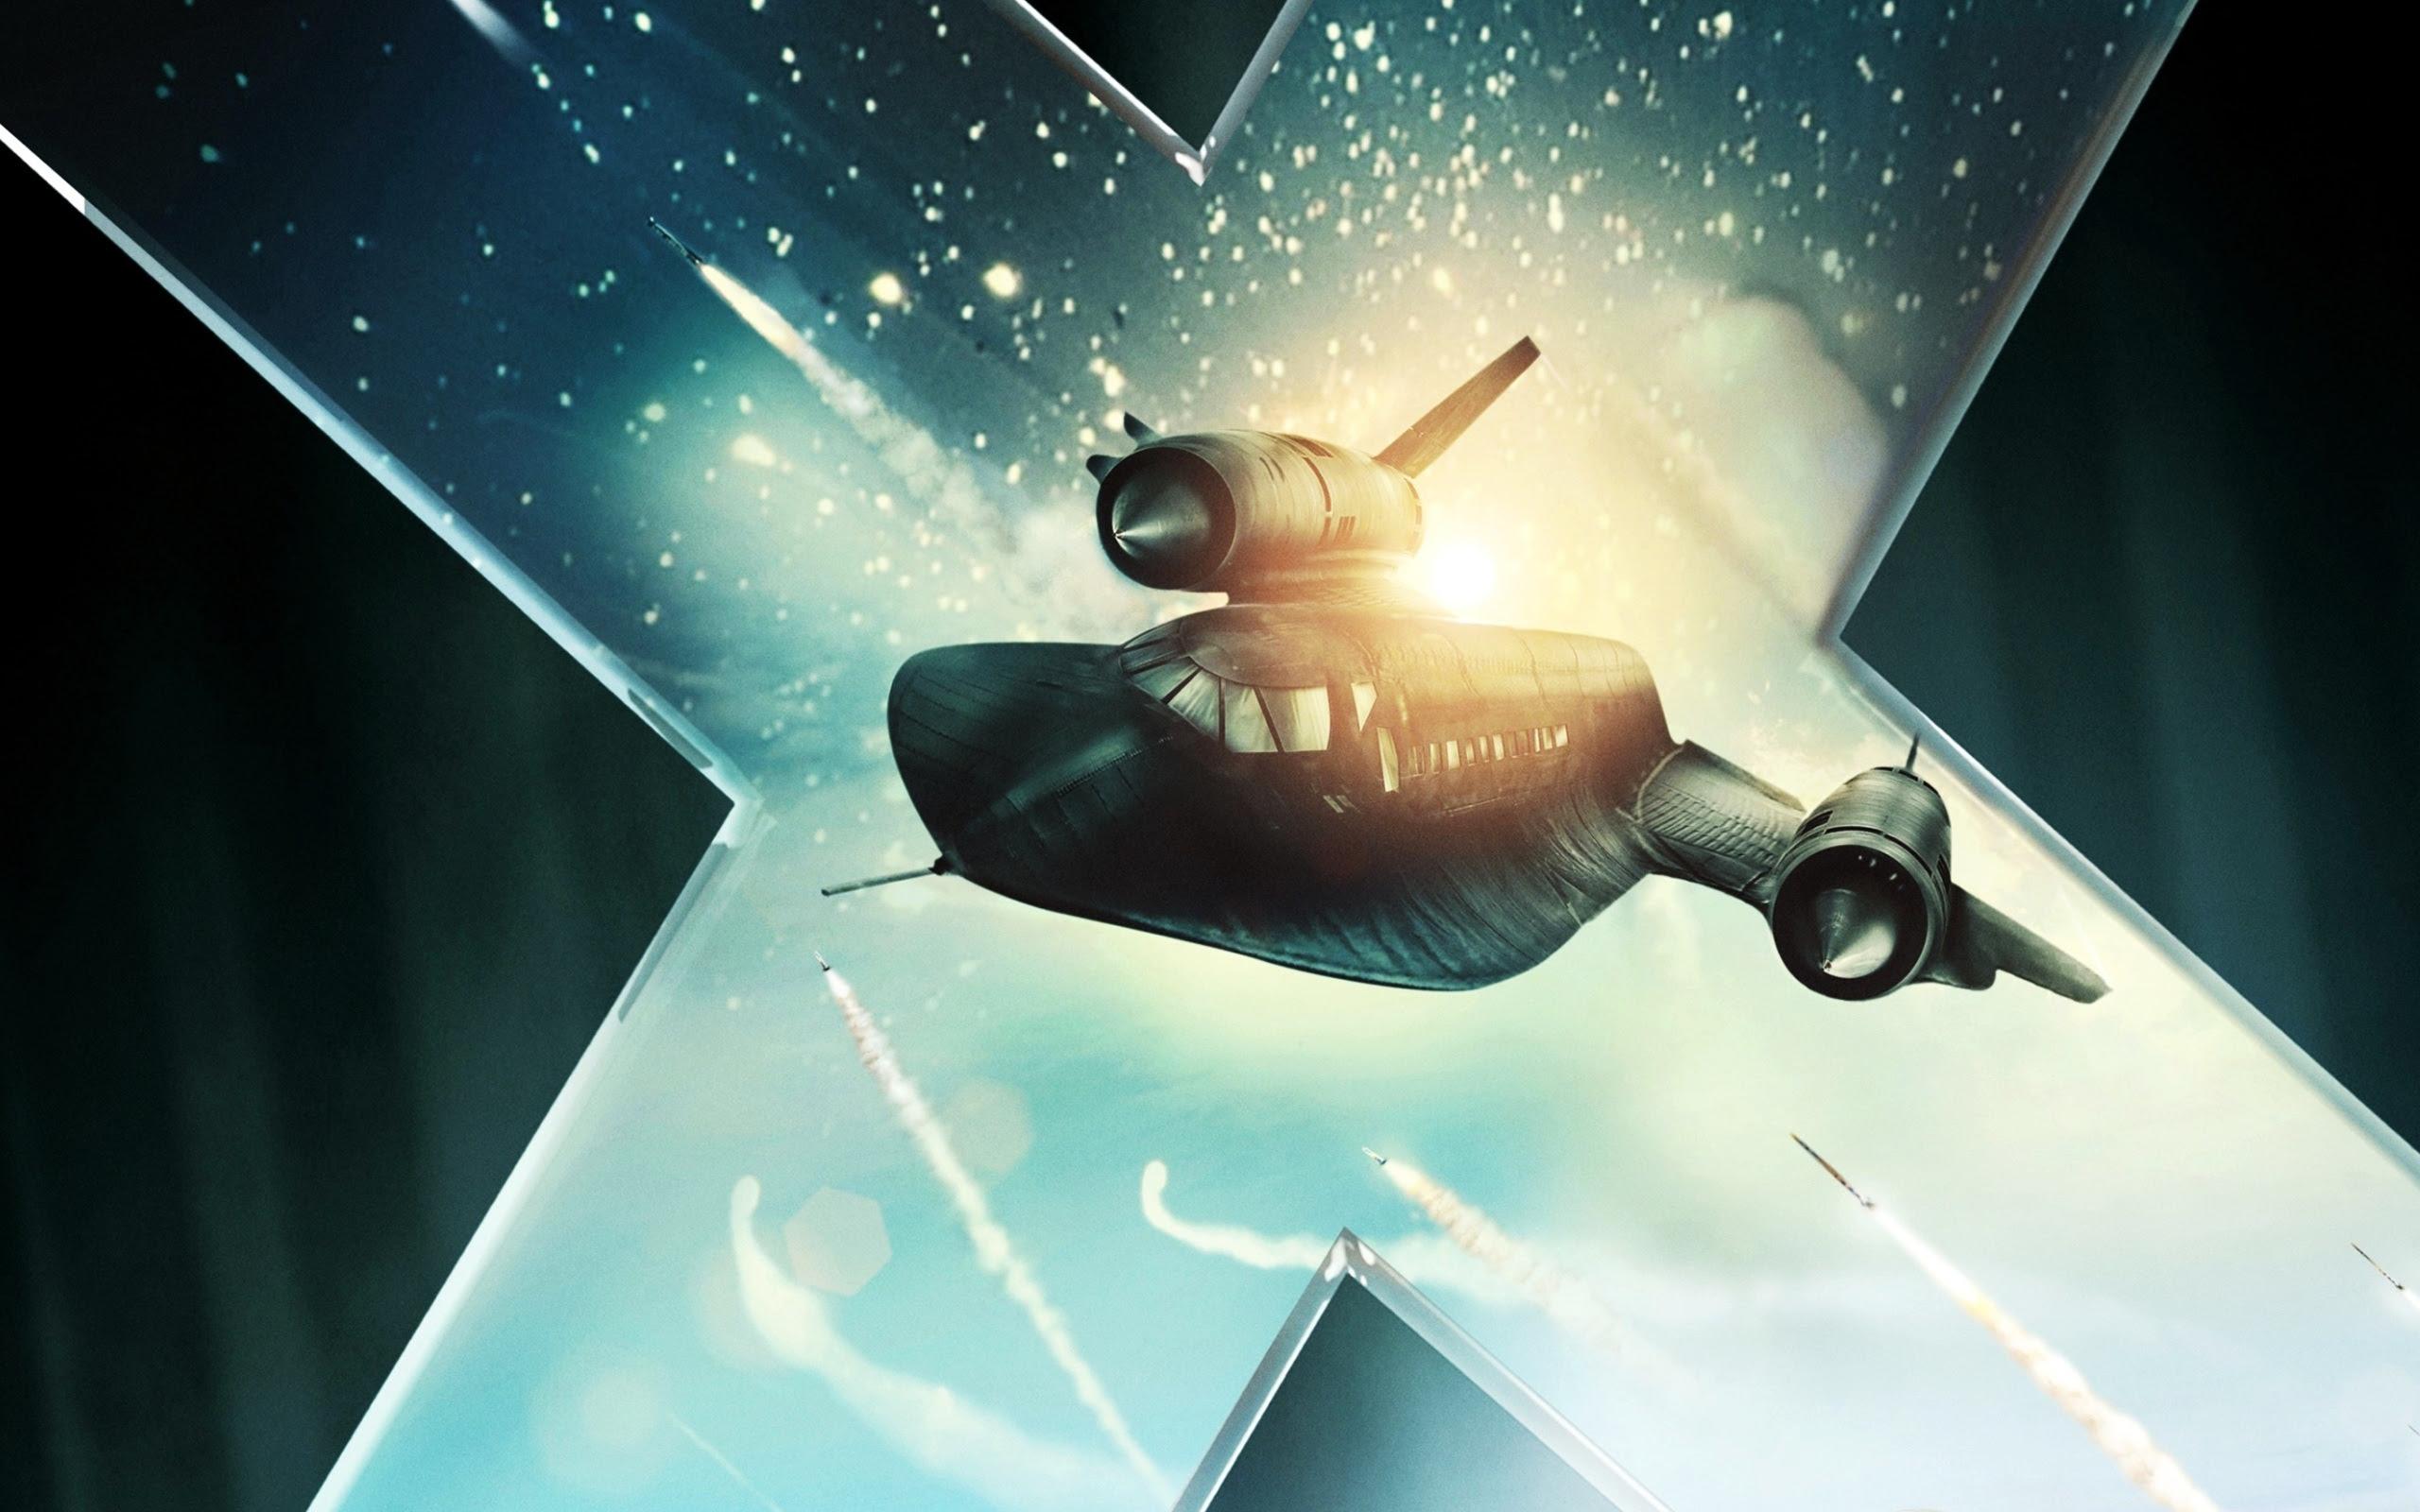 X Men First Class Fighter Jet Wallpapers Wallpapers Hd